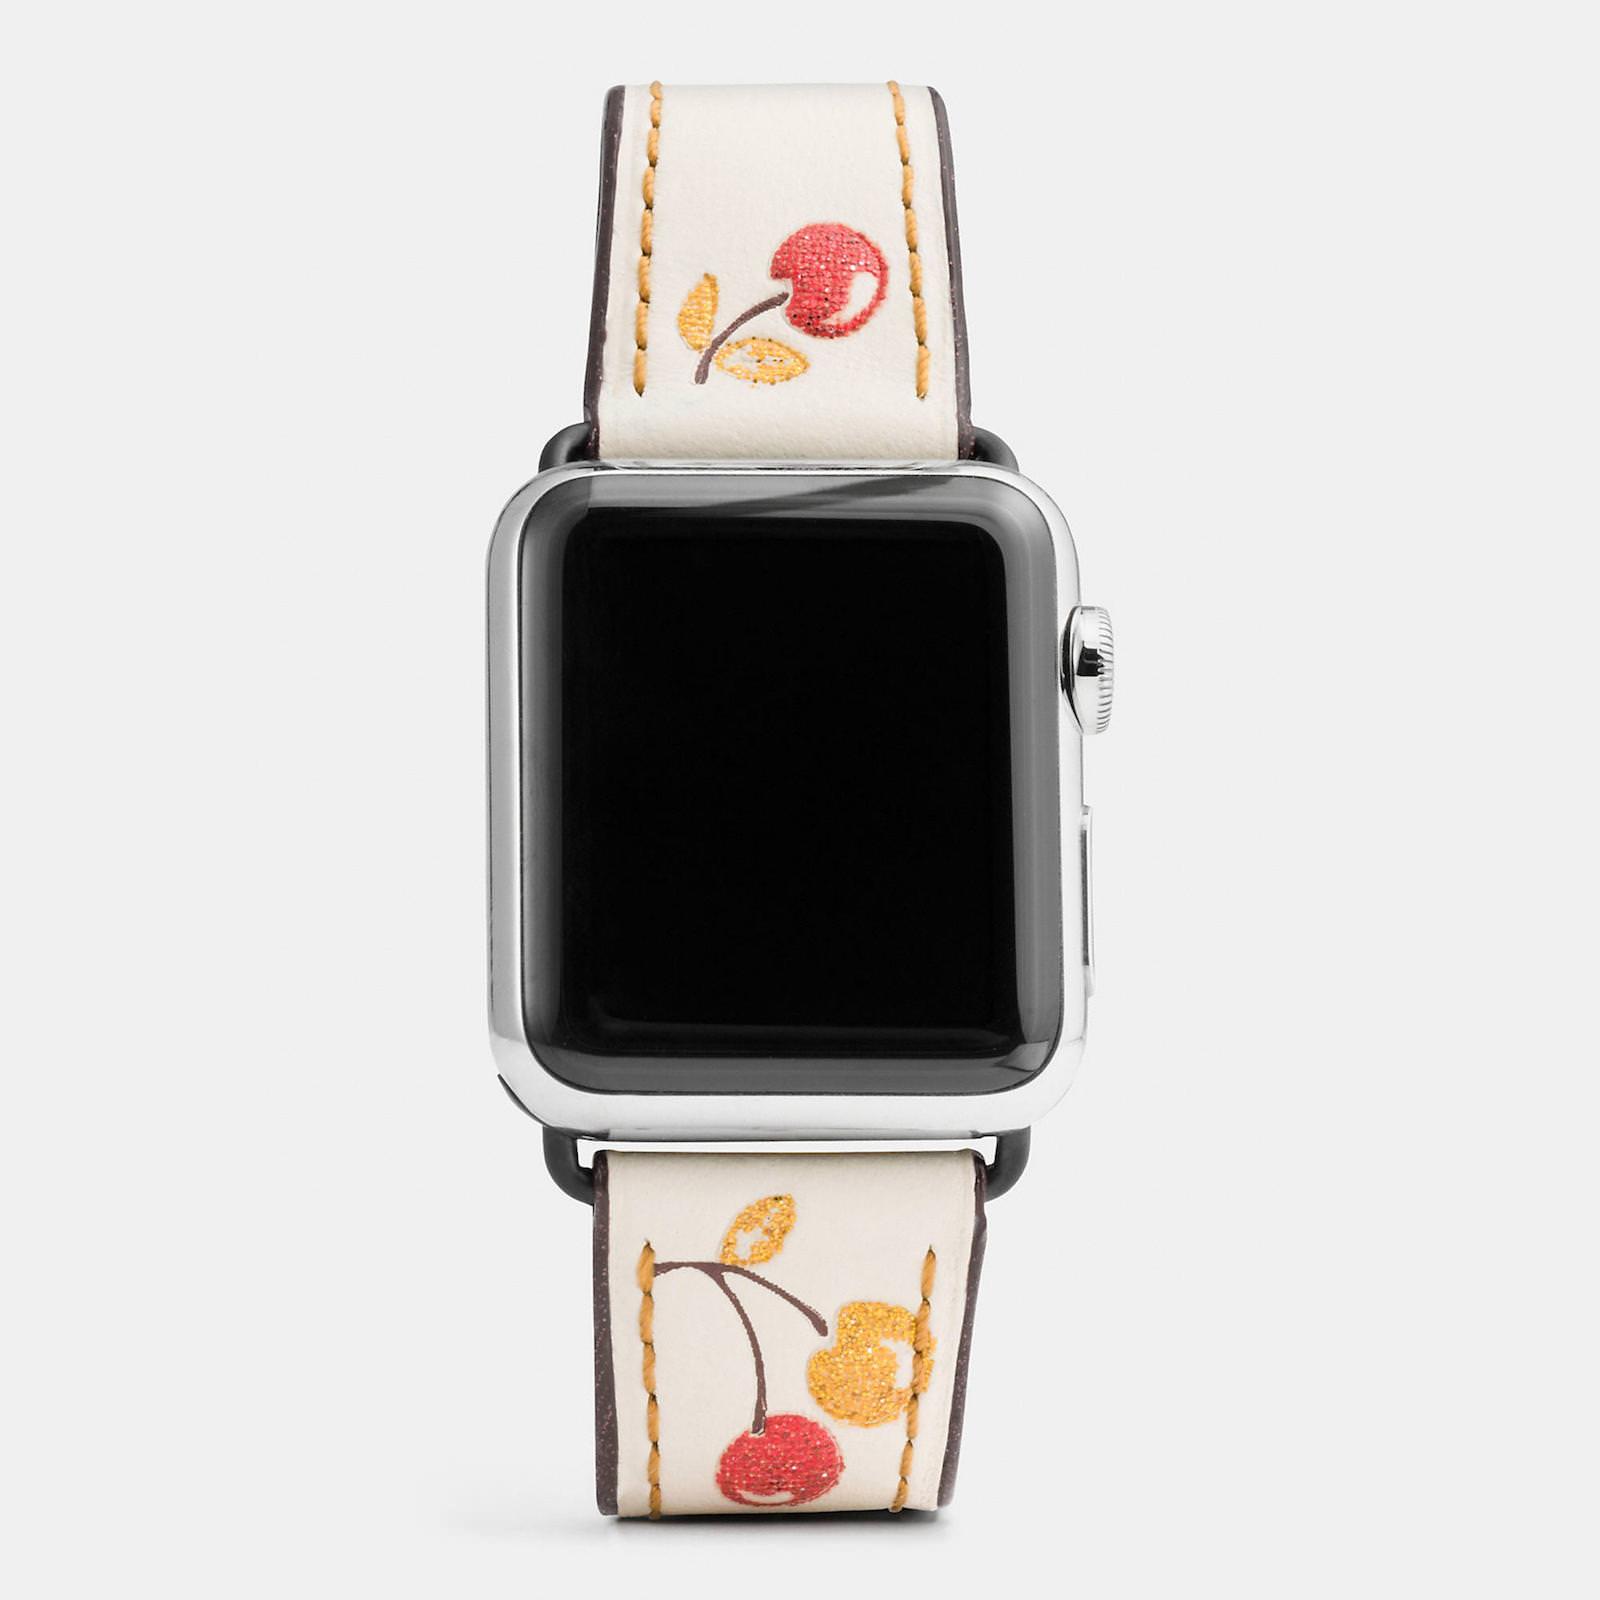 Apple-Watch-Coach-Band-Autumn-Season-5.jpeg